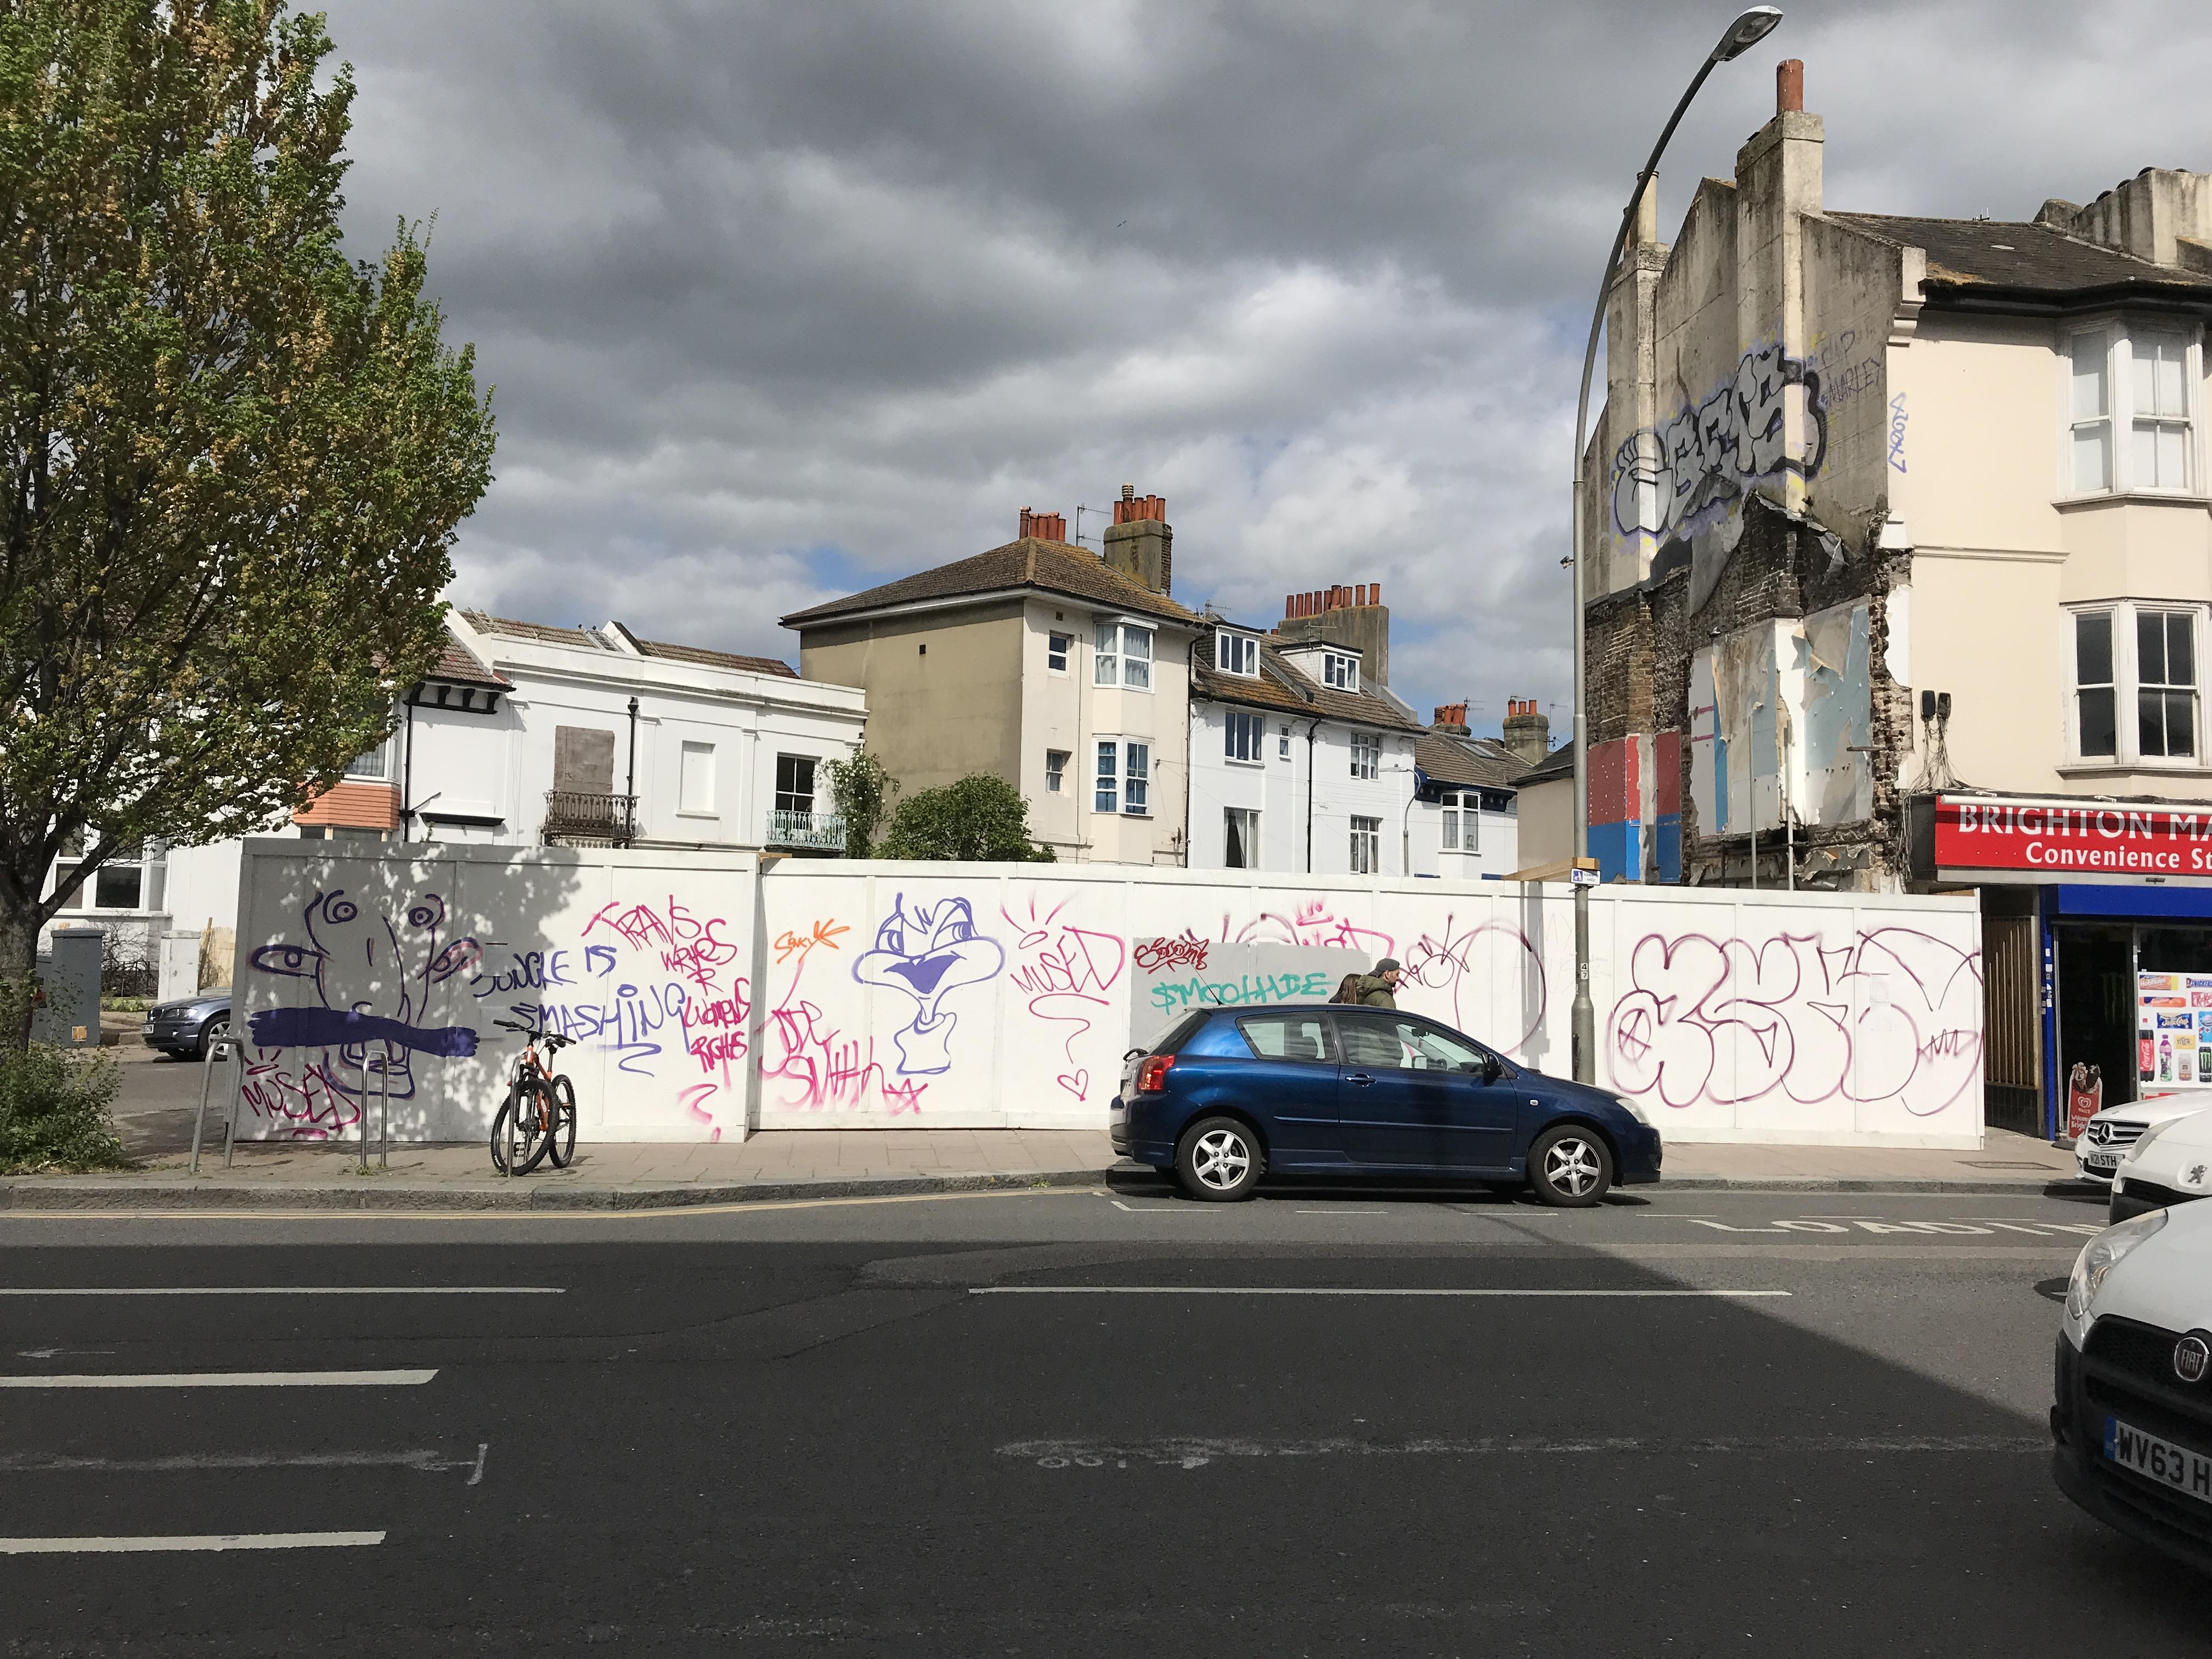 Brighton image.